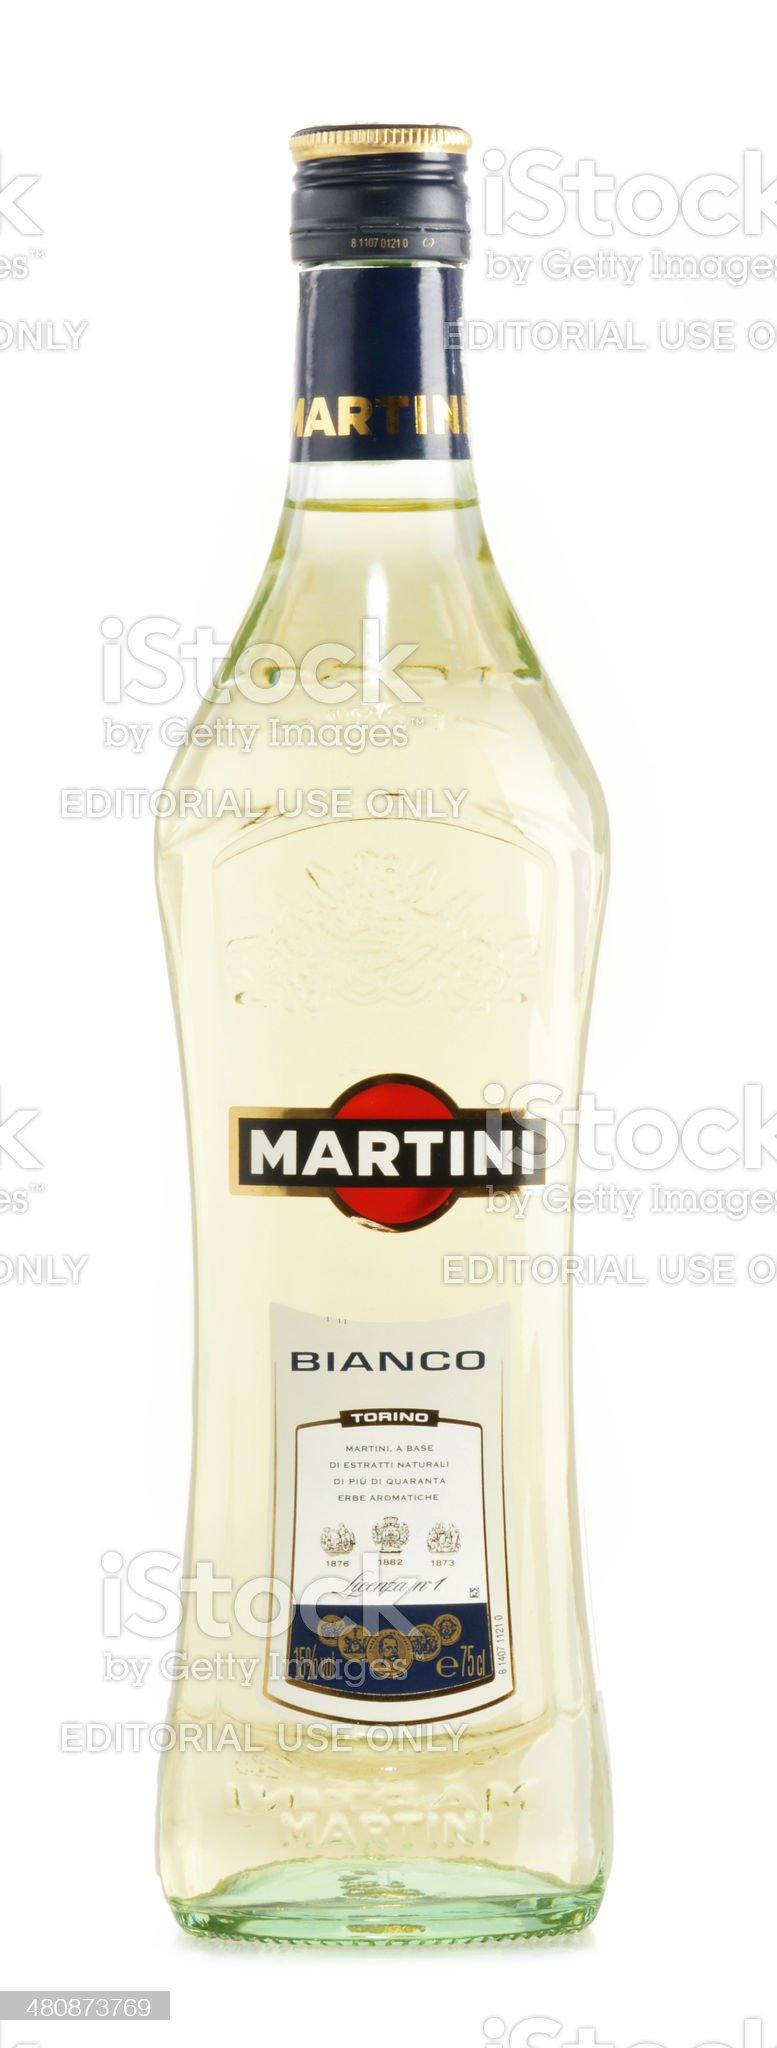 Bottle of Martini isolated on white royalty-free stock photo